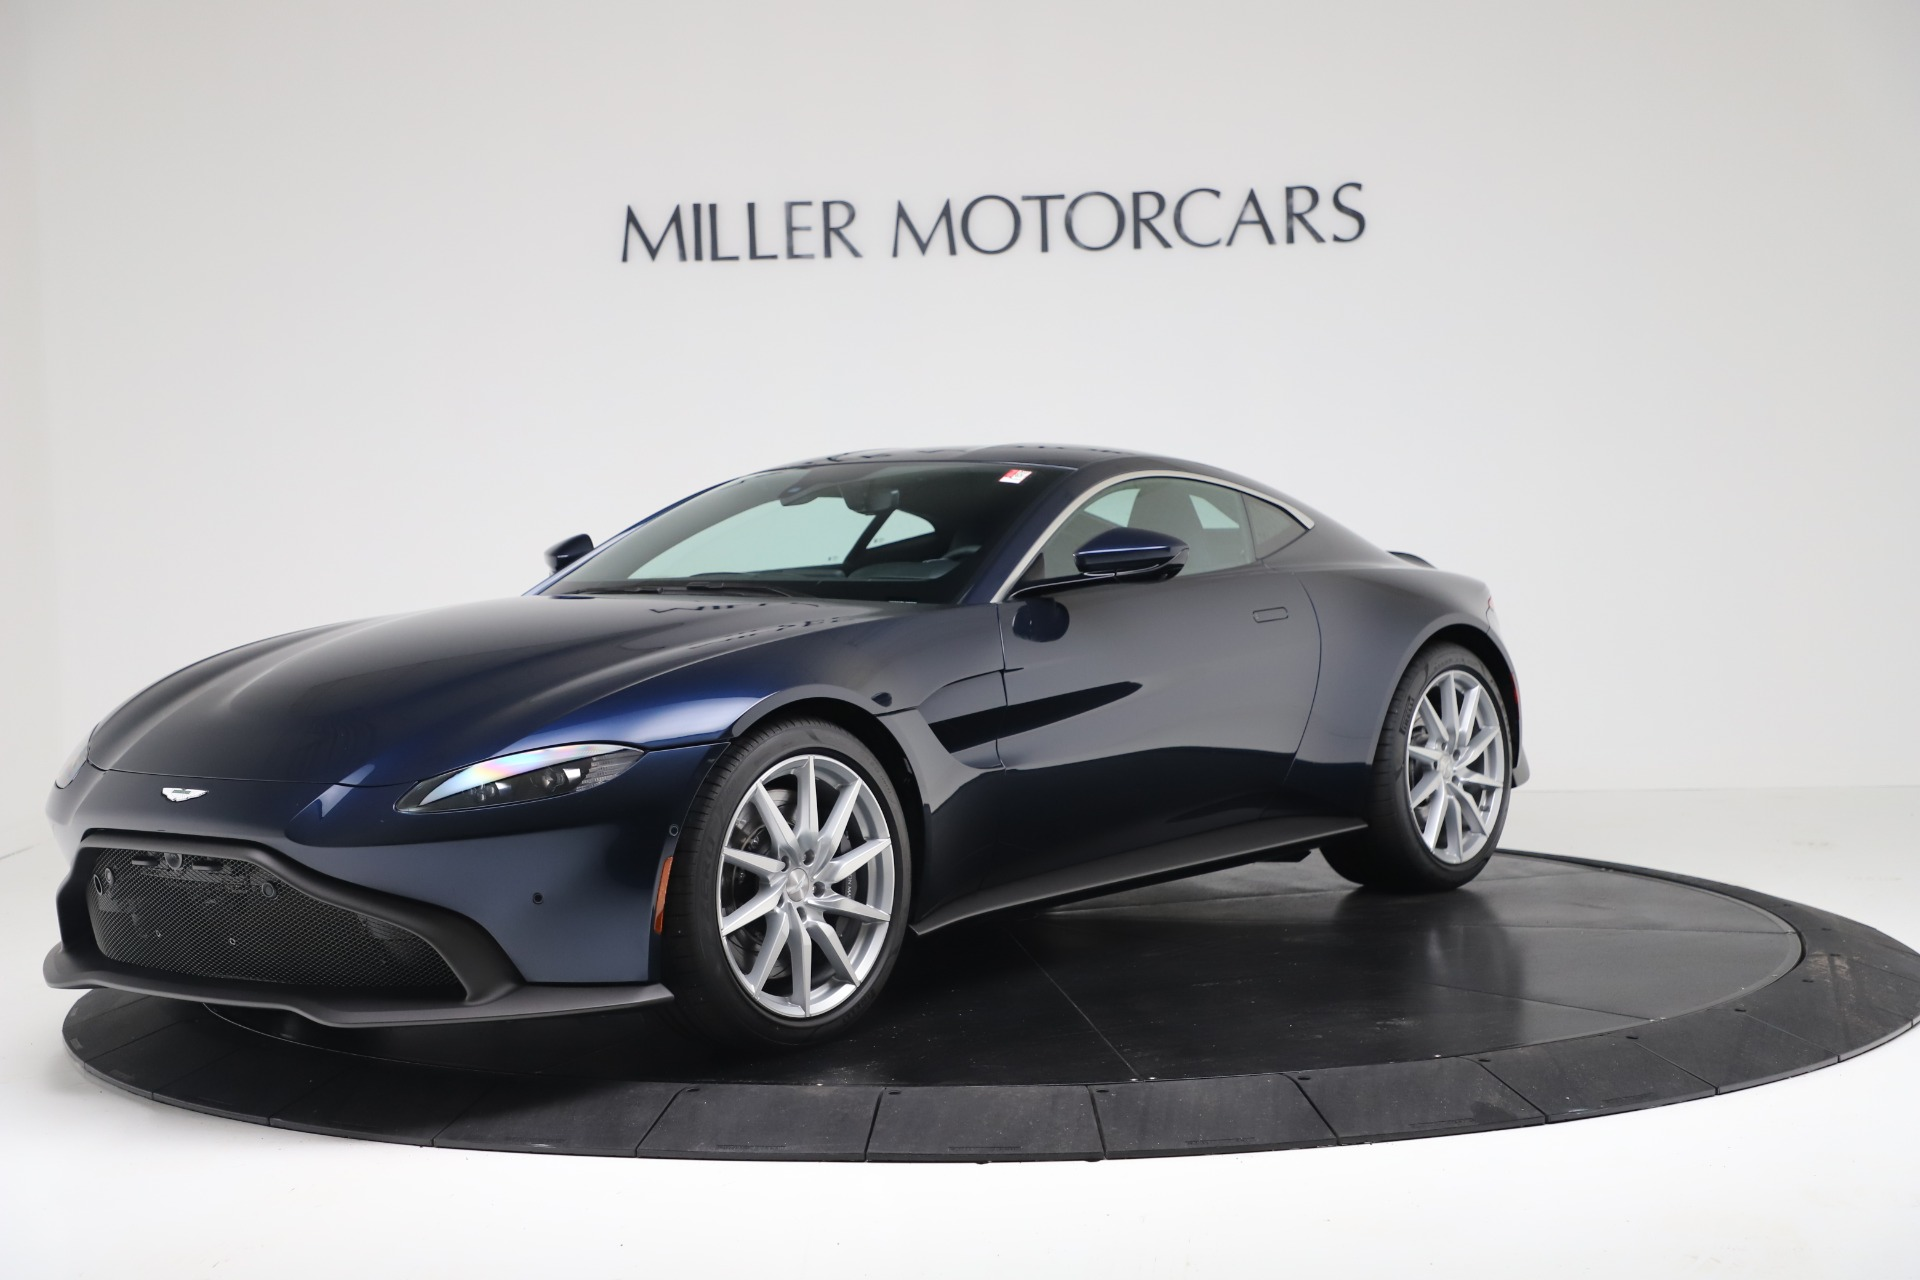 New 2020 Aston Martin Vantage V8 For Sale 167094 In Greenwich, CT